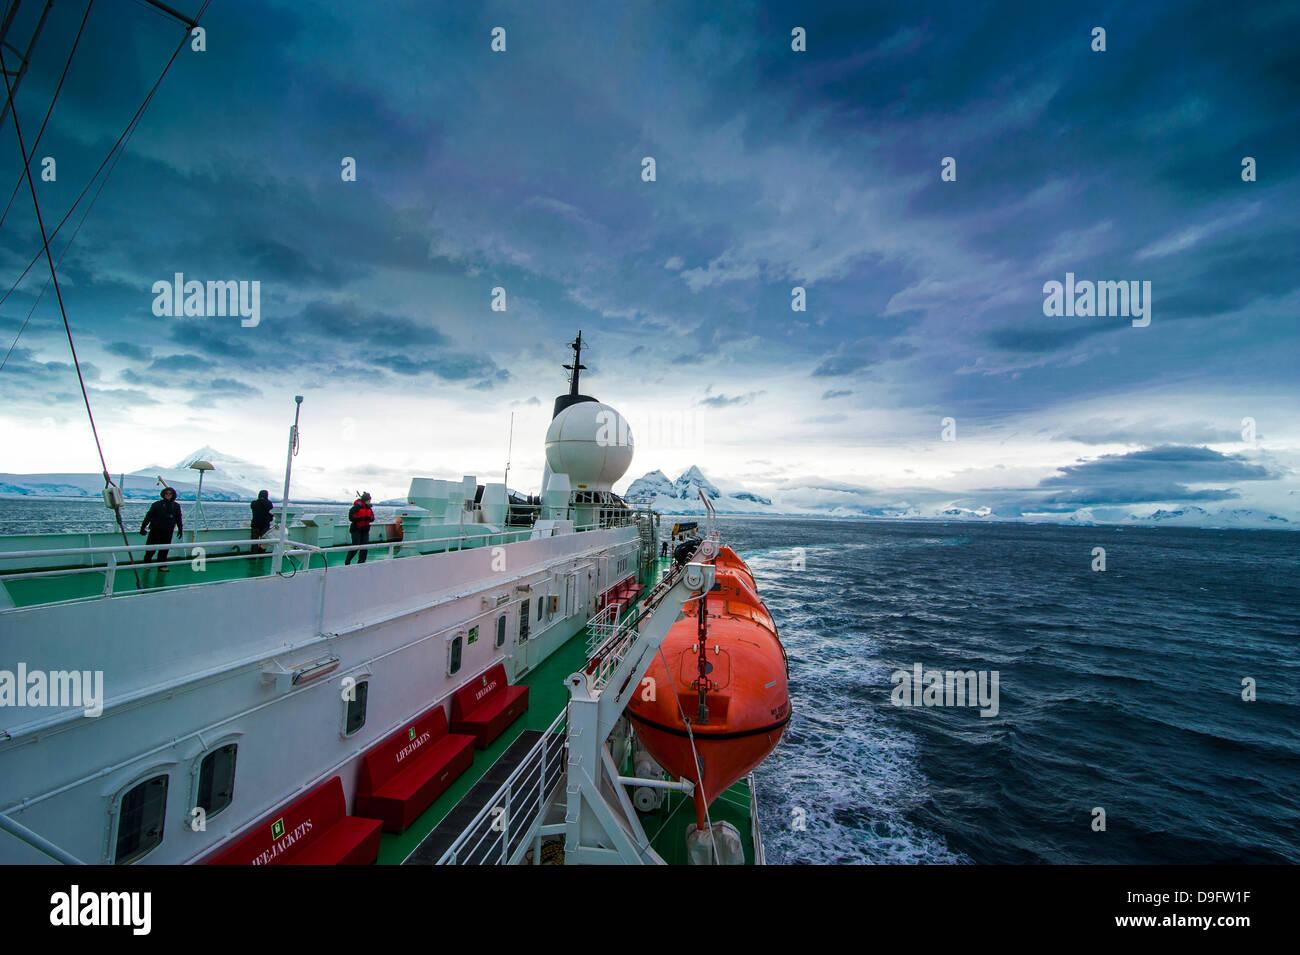 Port Lockroy stazione di ricerca, l'Antartide, regioni polari Foto Stock